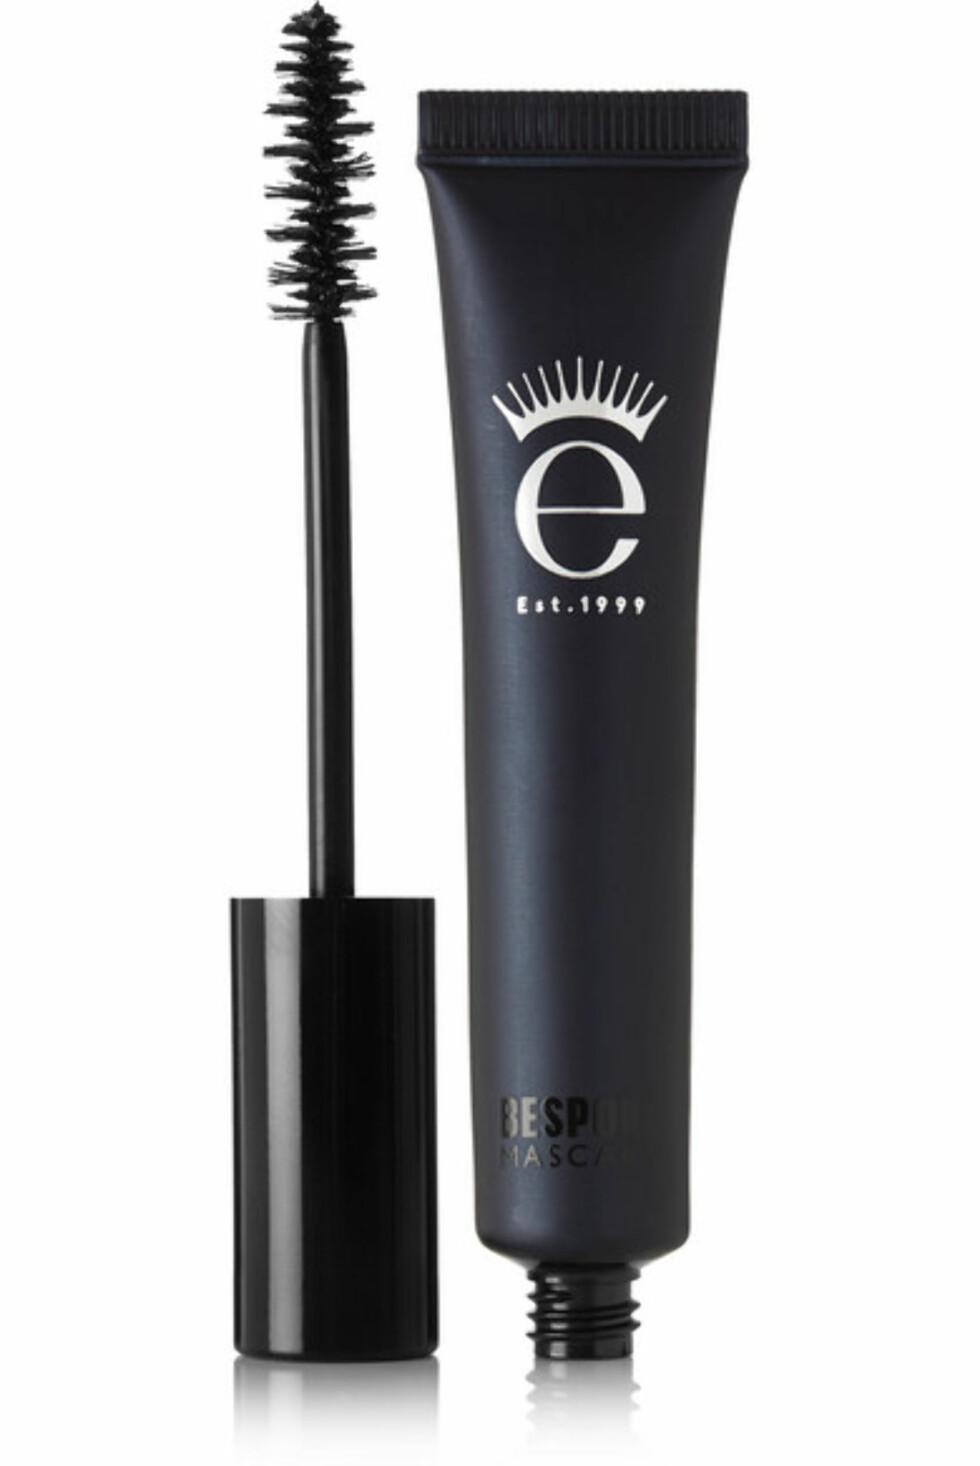 Maskara fra Eyeko |344,-| https://www.net-a-porter.com/no/en/product/1068835/eyeko/bespoke-mascara---black